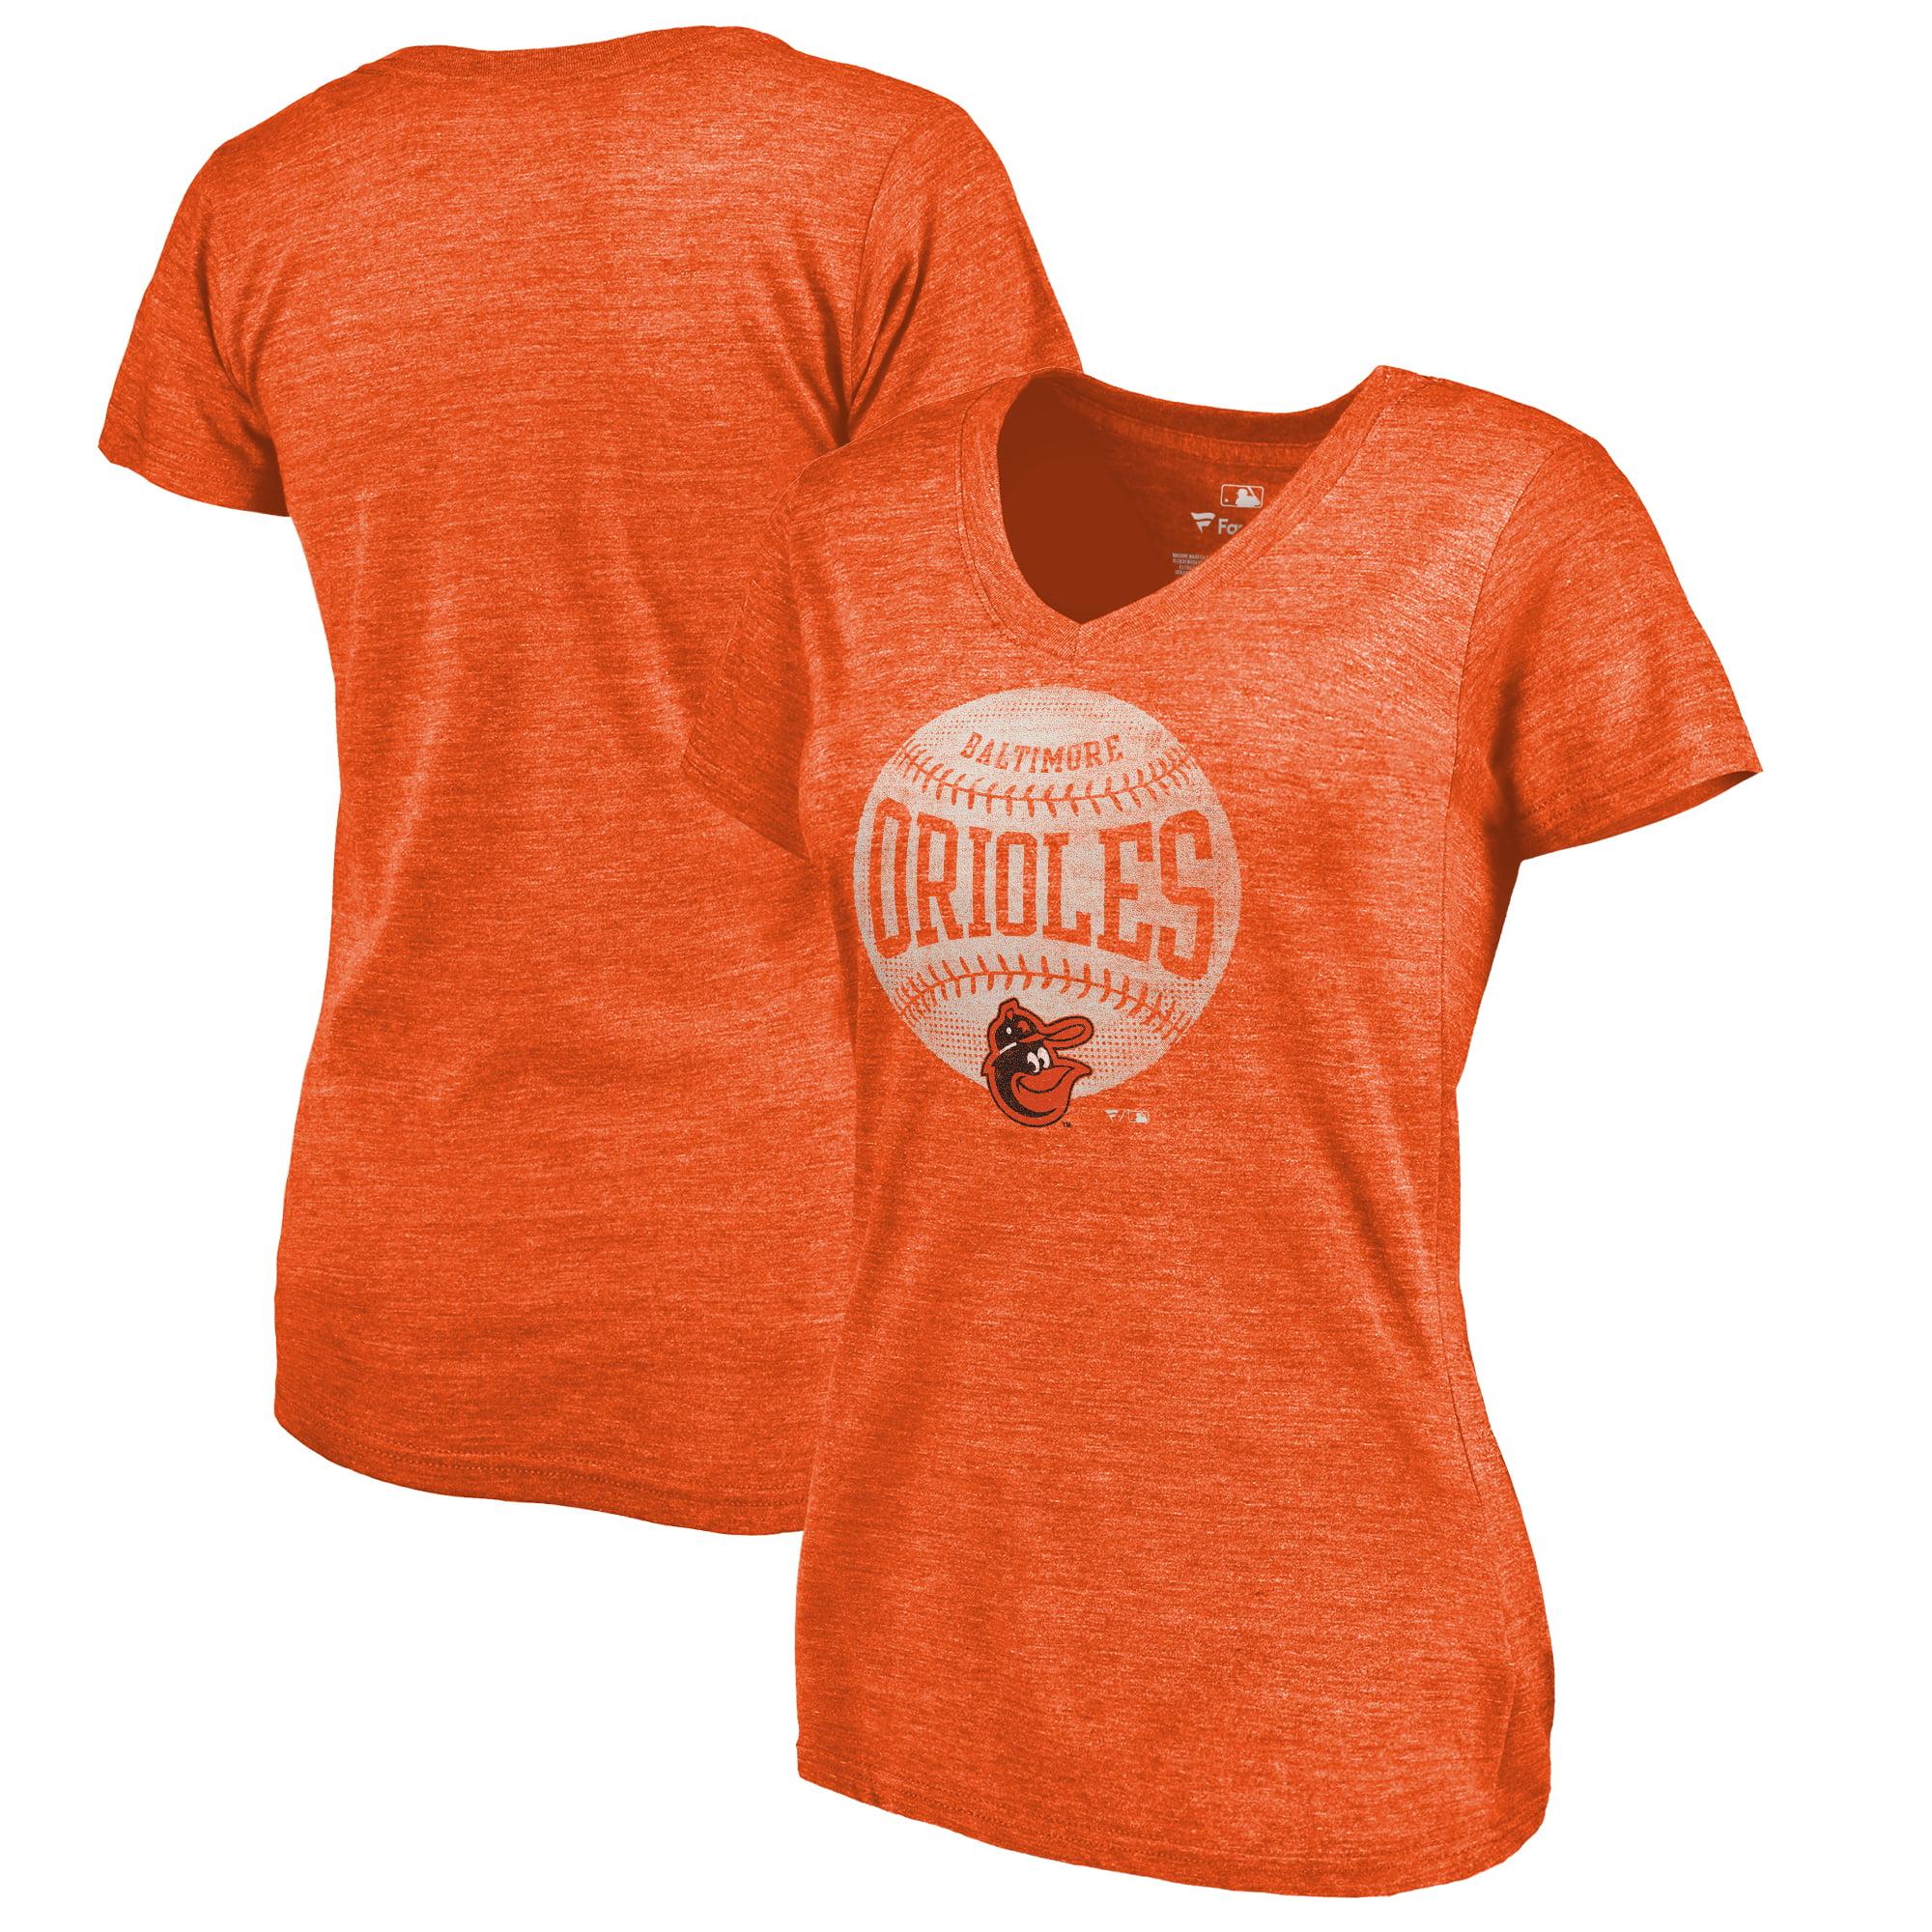 Baltimore Orioles Fanatics Branded Women's Cooperstown Collection Slider Tri-Blend V-Neck T-Shirt - Heathered Orange